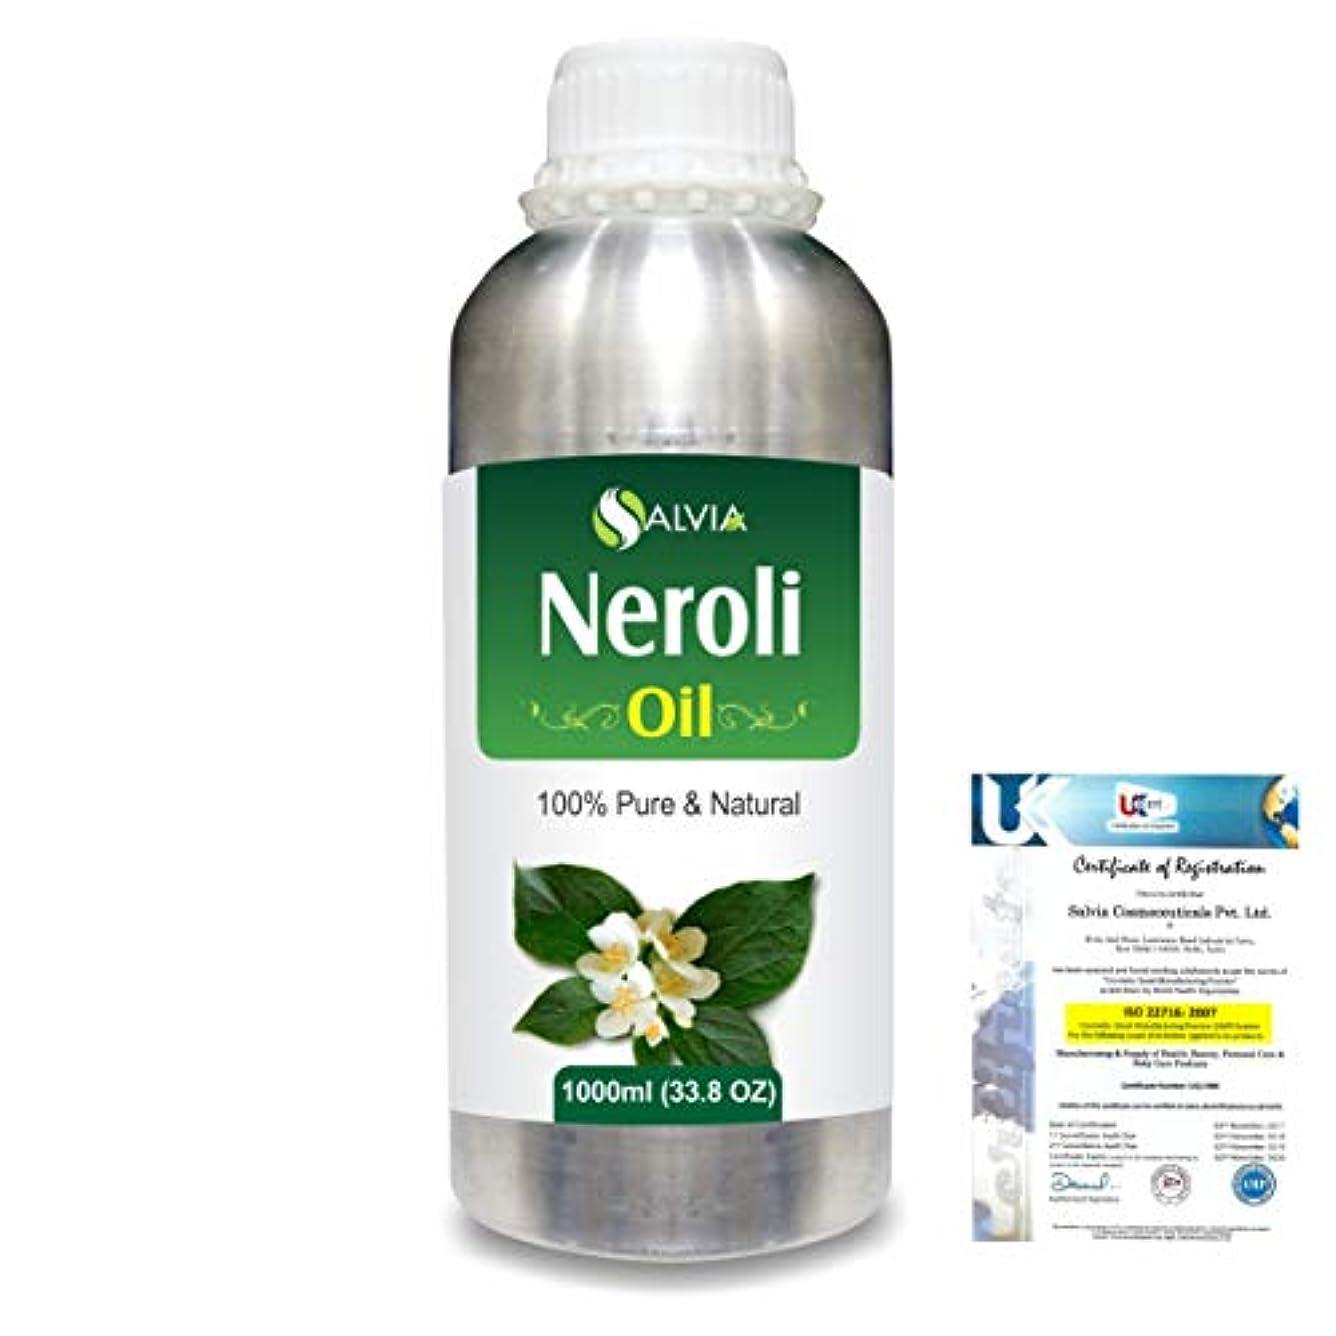 知的悲観主義者悪意Neroli (Citrus Aurantium) 100% Natural Pure Essential Oil 1000ml/33.8fl.oz.